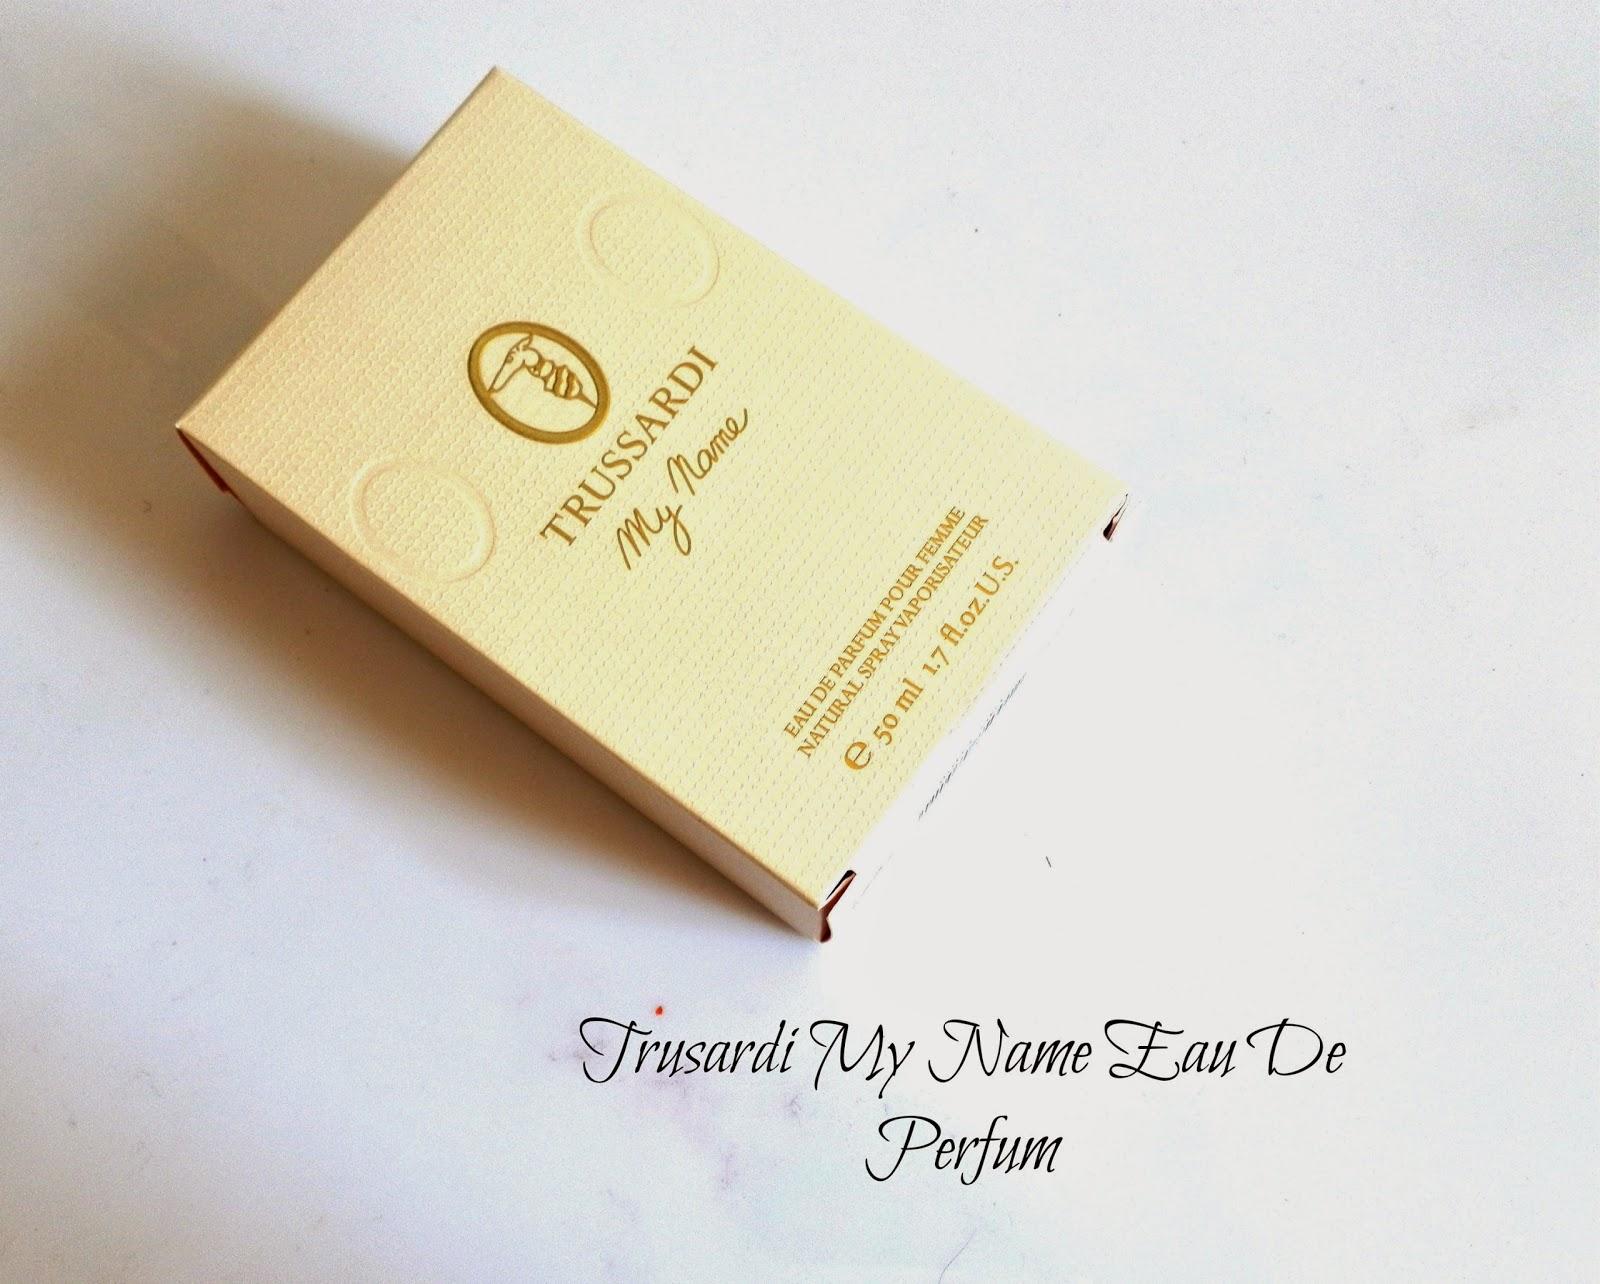 Trusardi My Name Eau De Perfum